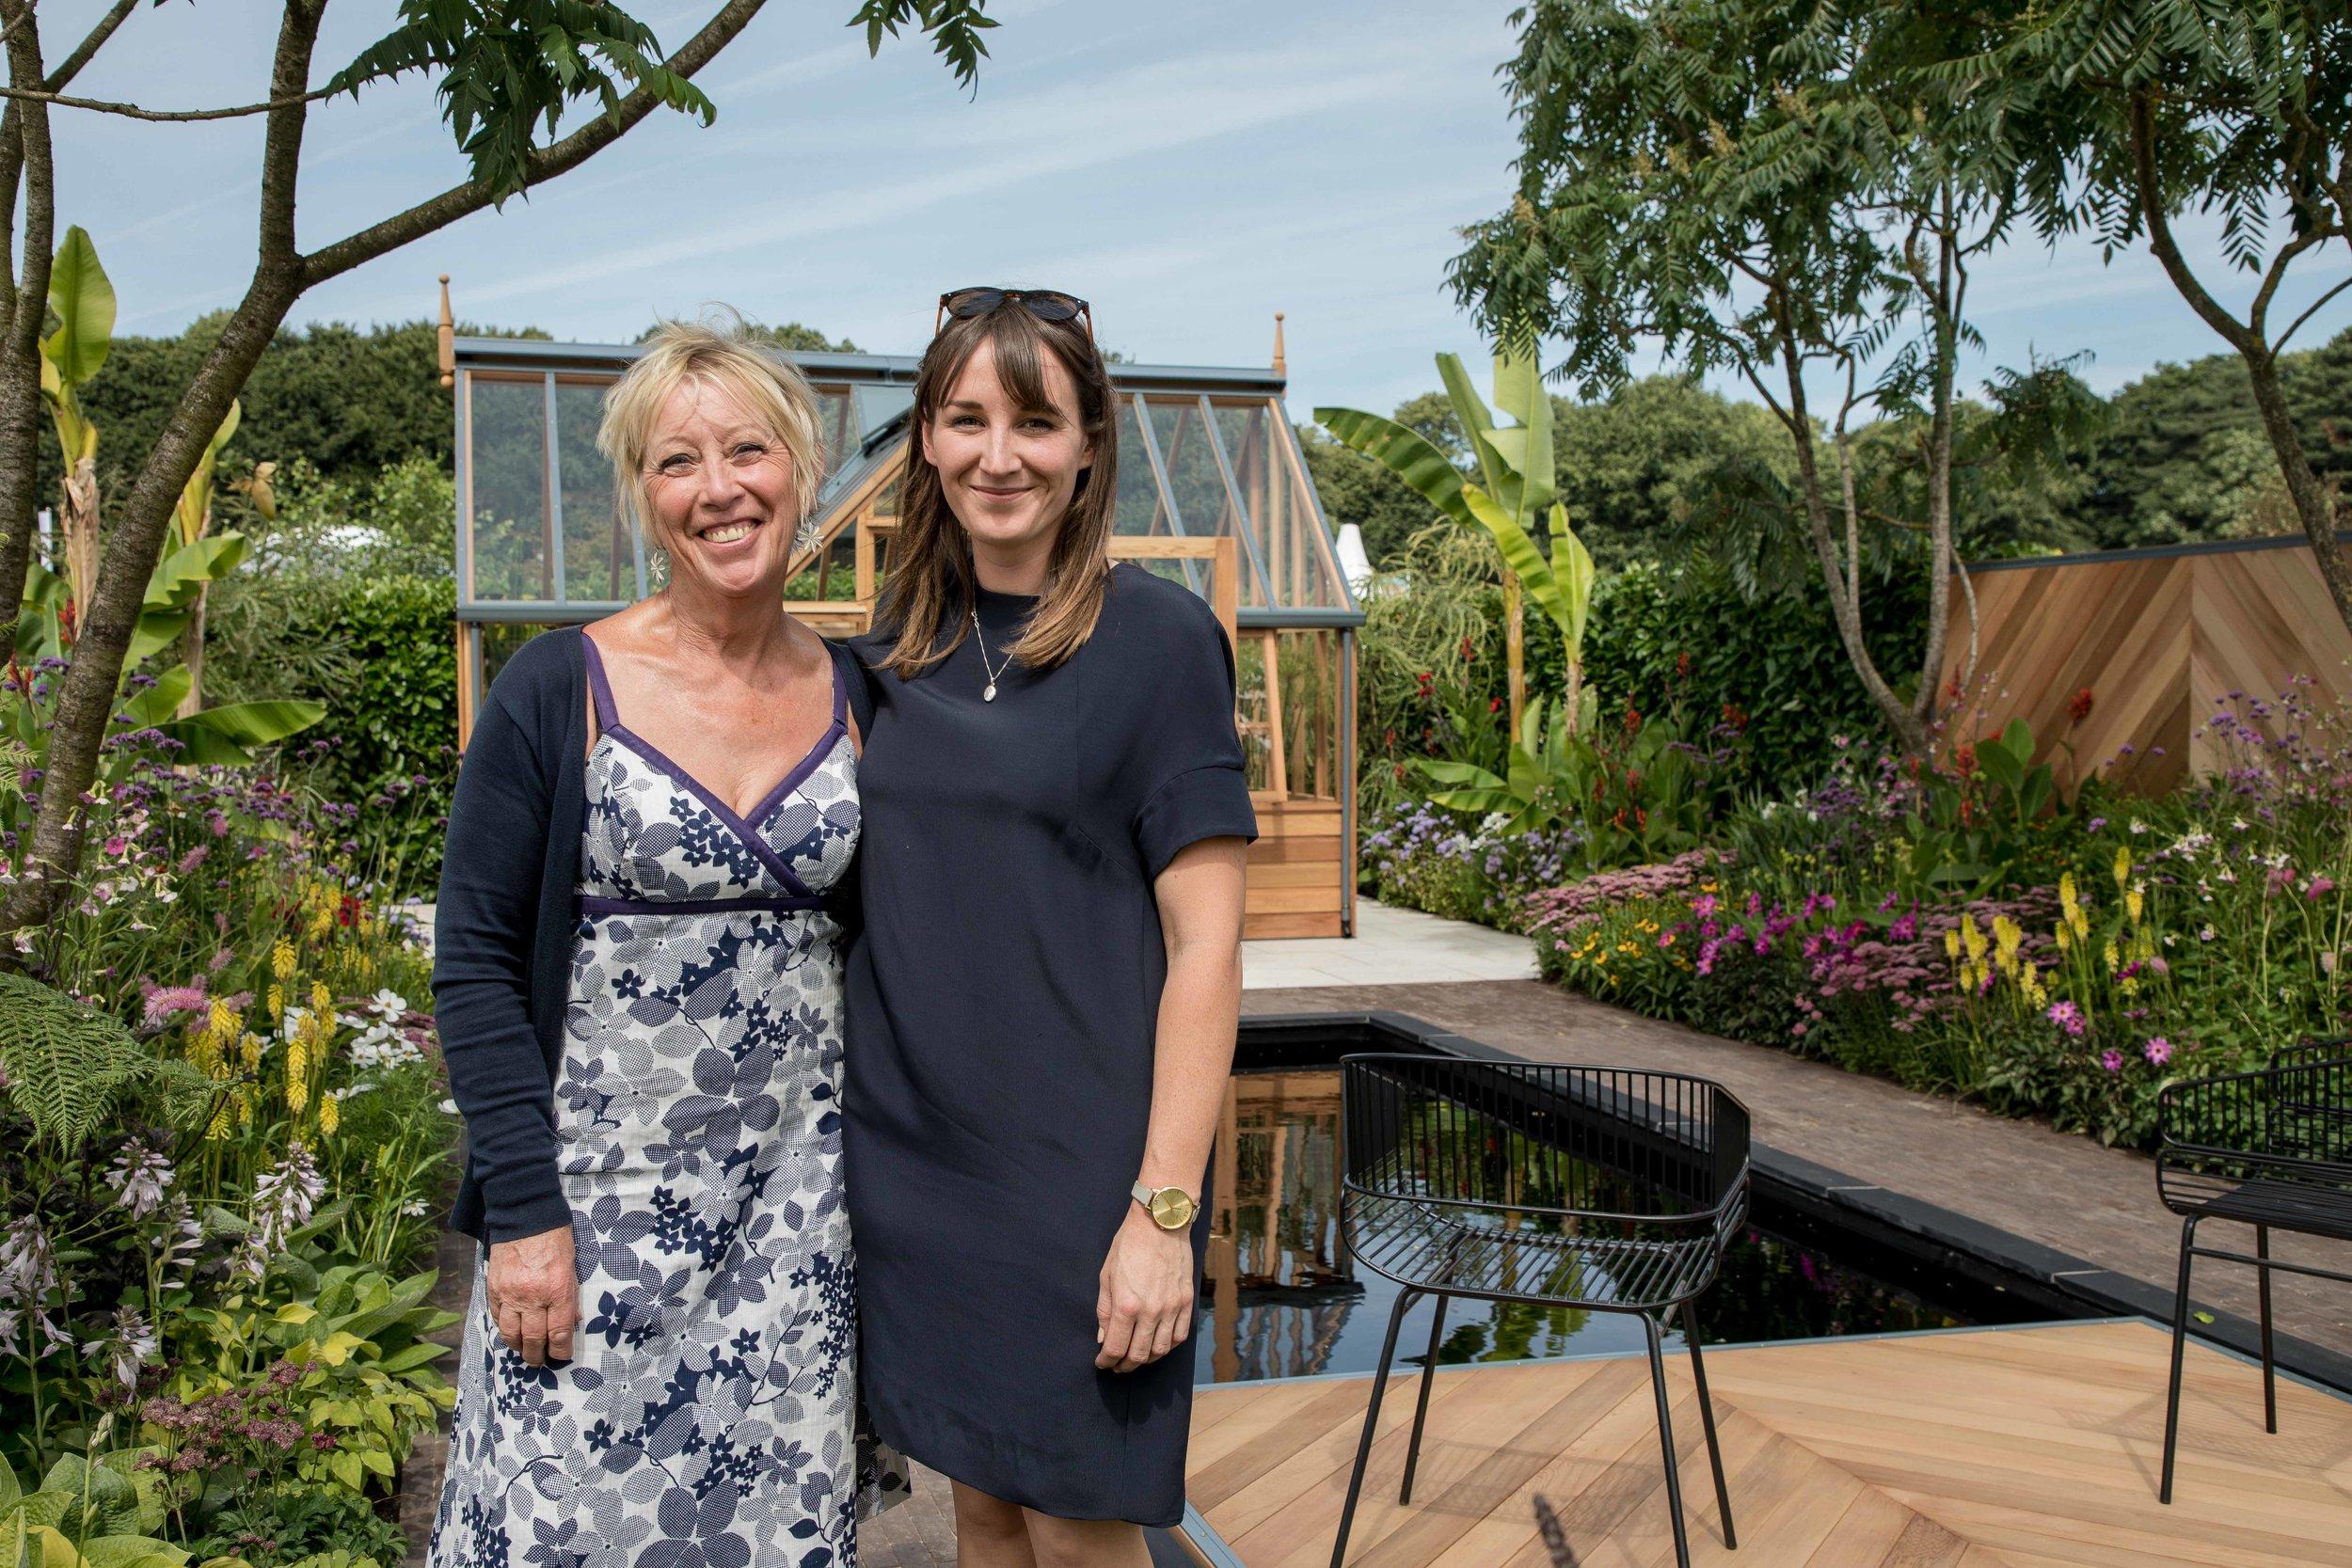 Carol Klein and Lilly Gomm on the Gabriel Ash Greenhouse Garden